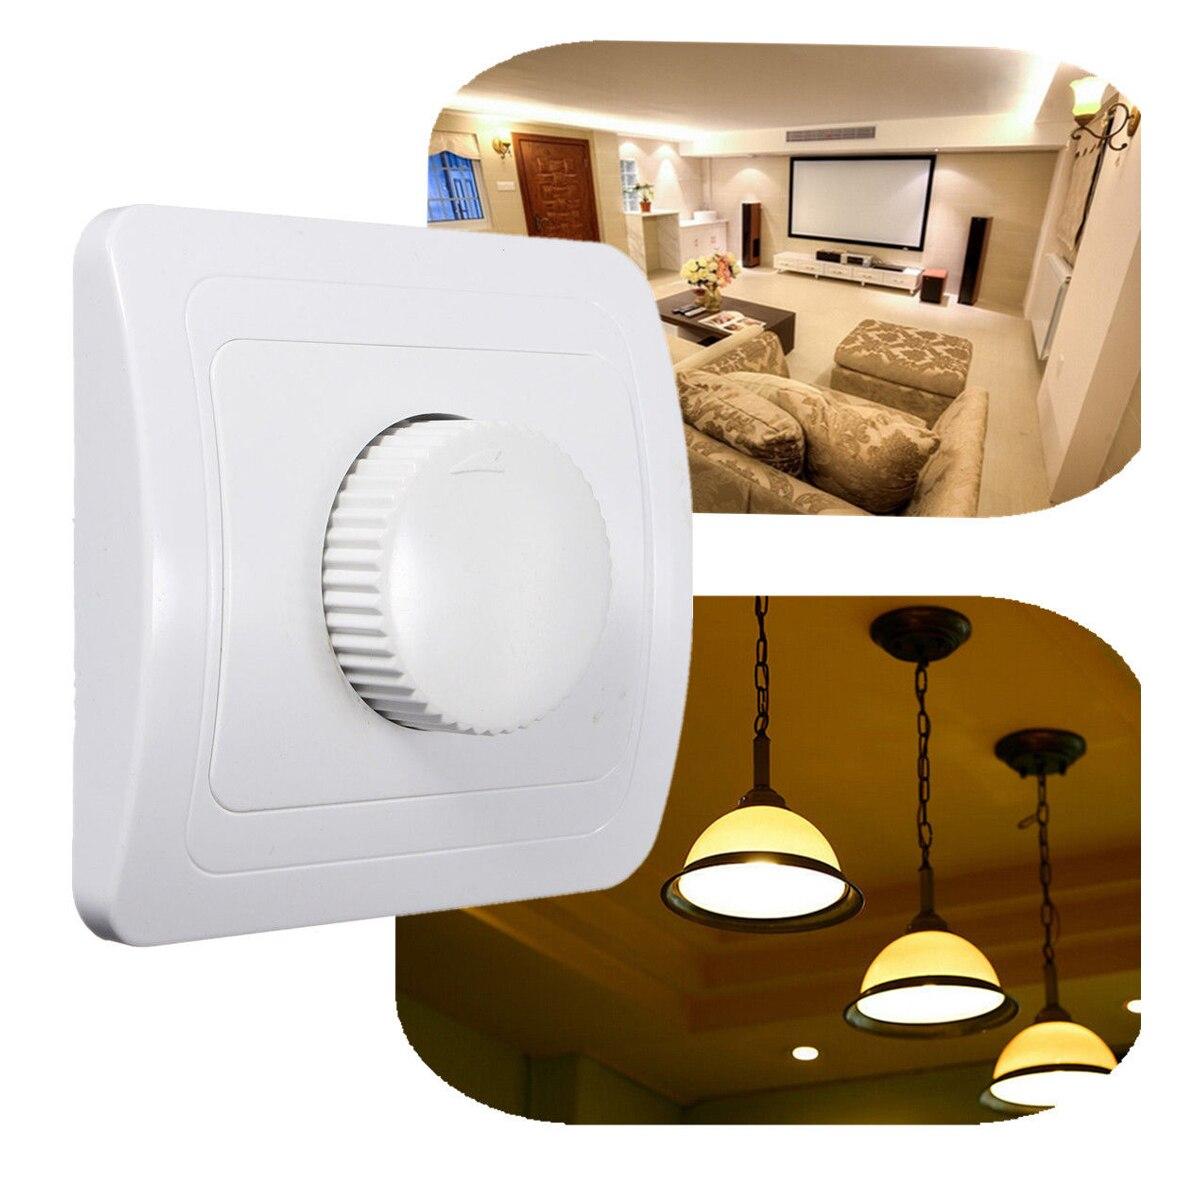 Hot sale110V / 220V Adjustable Controller Dimmer Switch For Dimmable Light Bulb Lamp White bedroom silver tone knob adjustable light controller dimmer switch